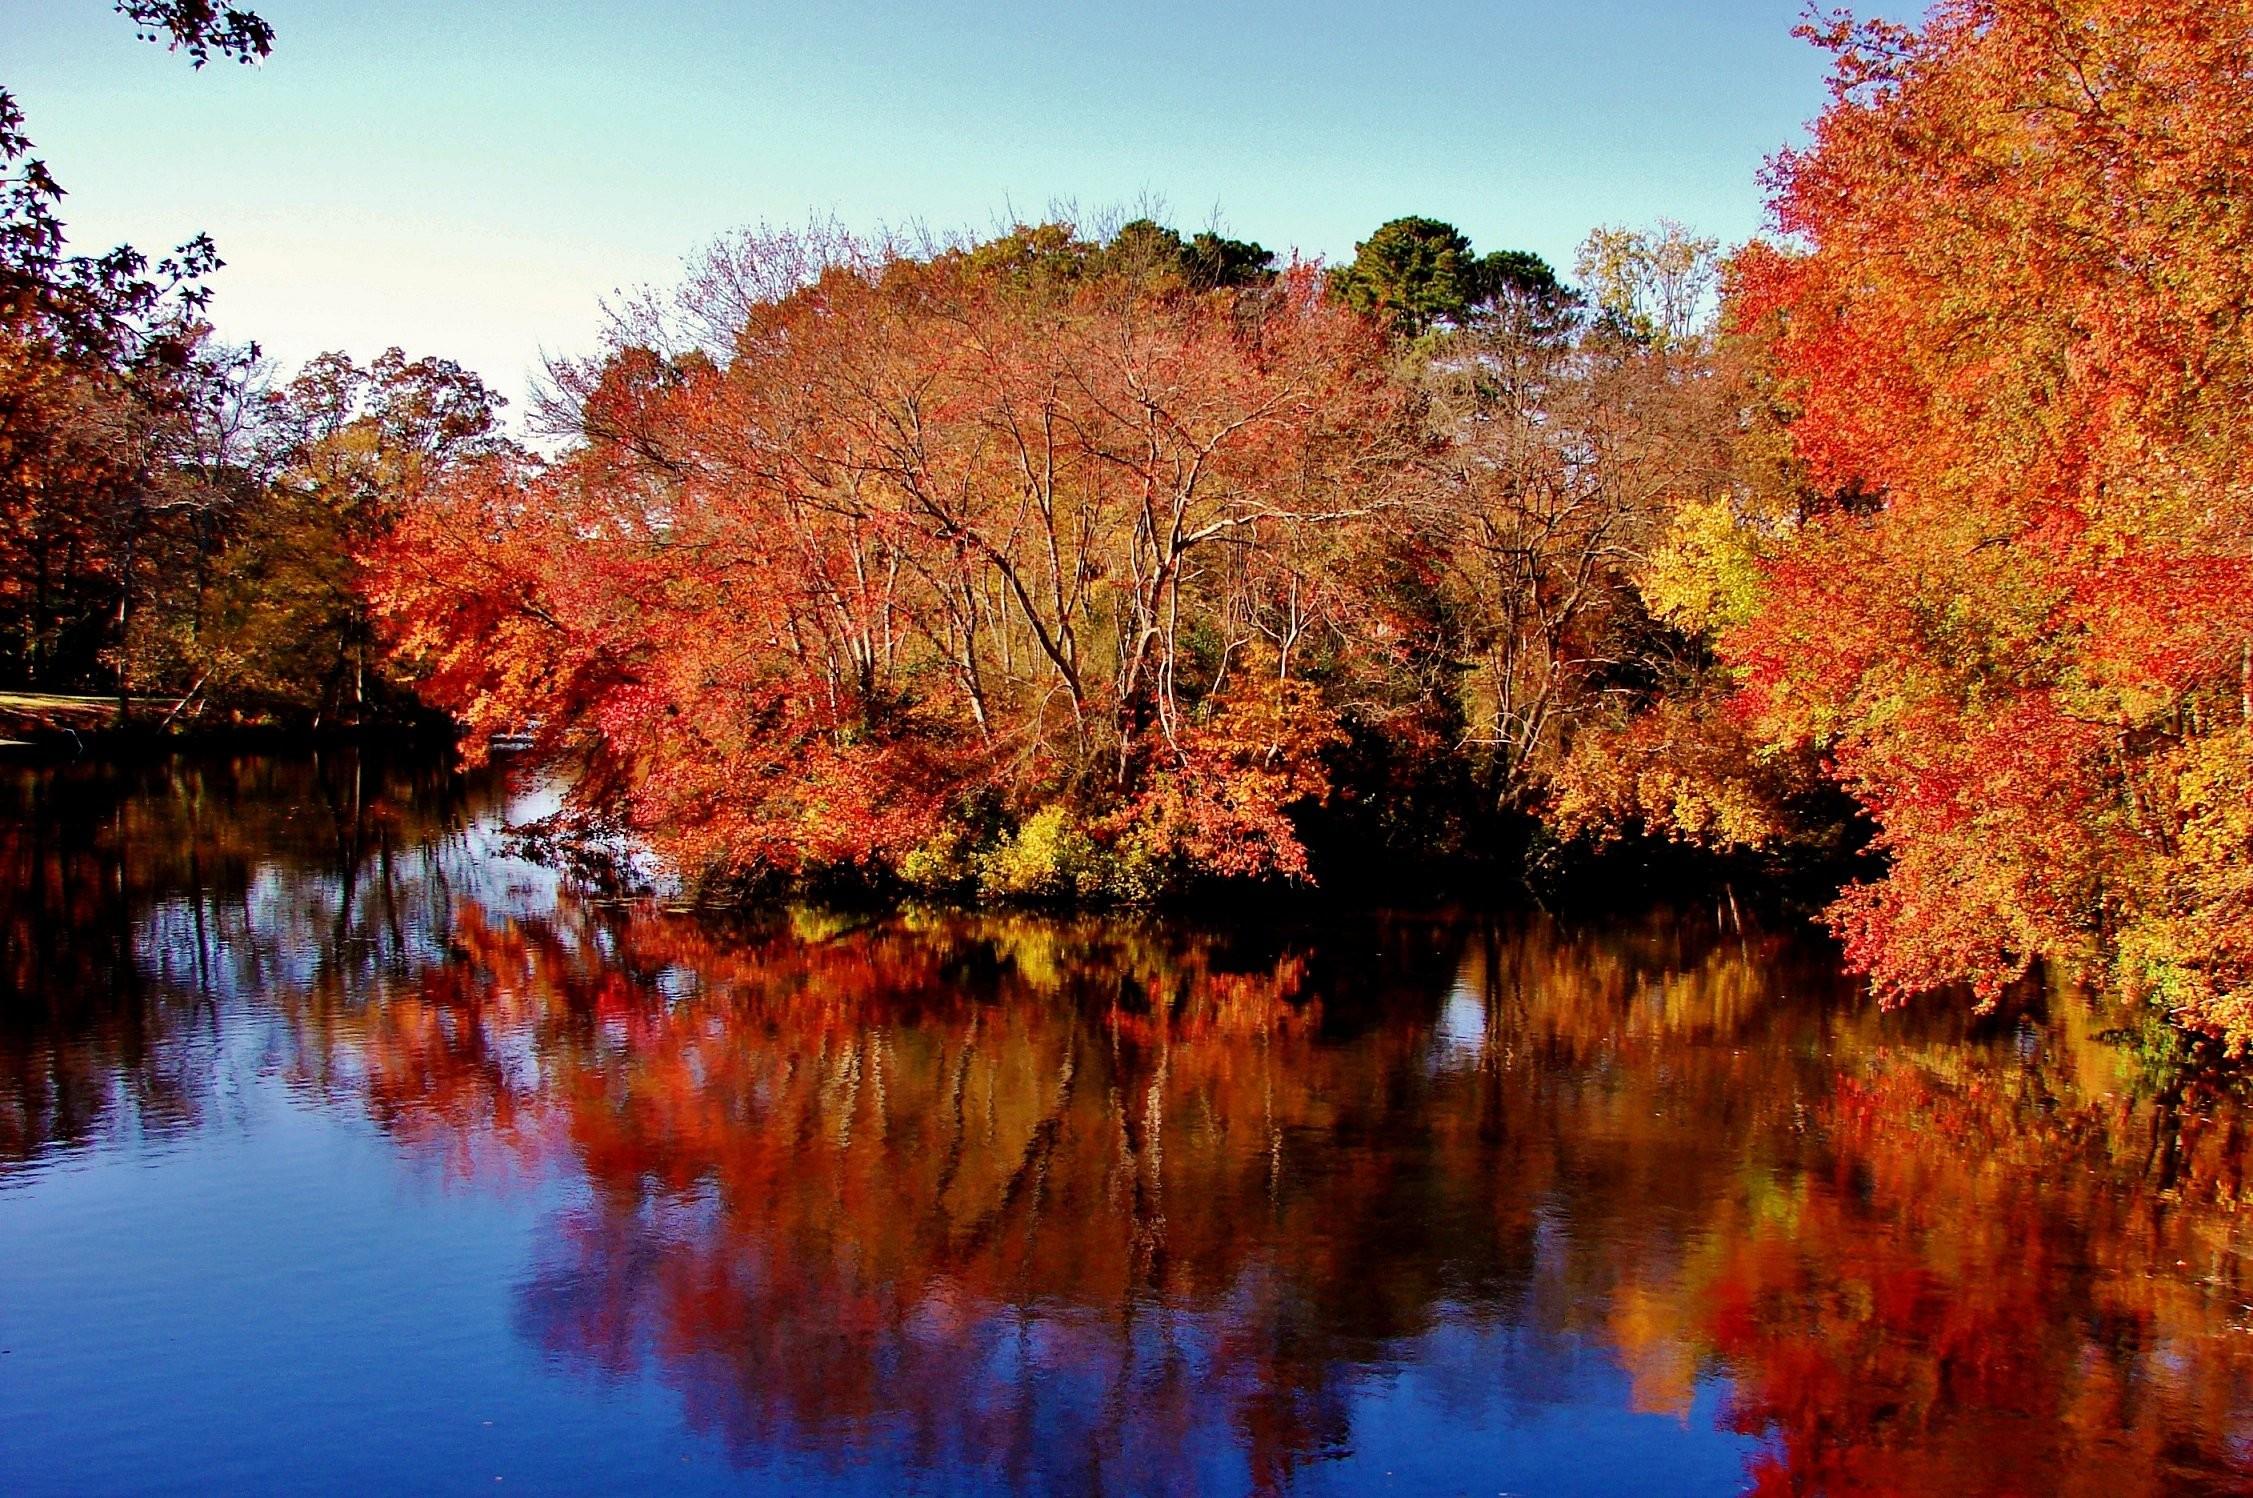 River Backgroundsautomne Wallpaper Wet Landscapes Cool Images 2253x1498